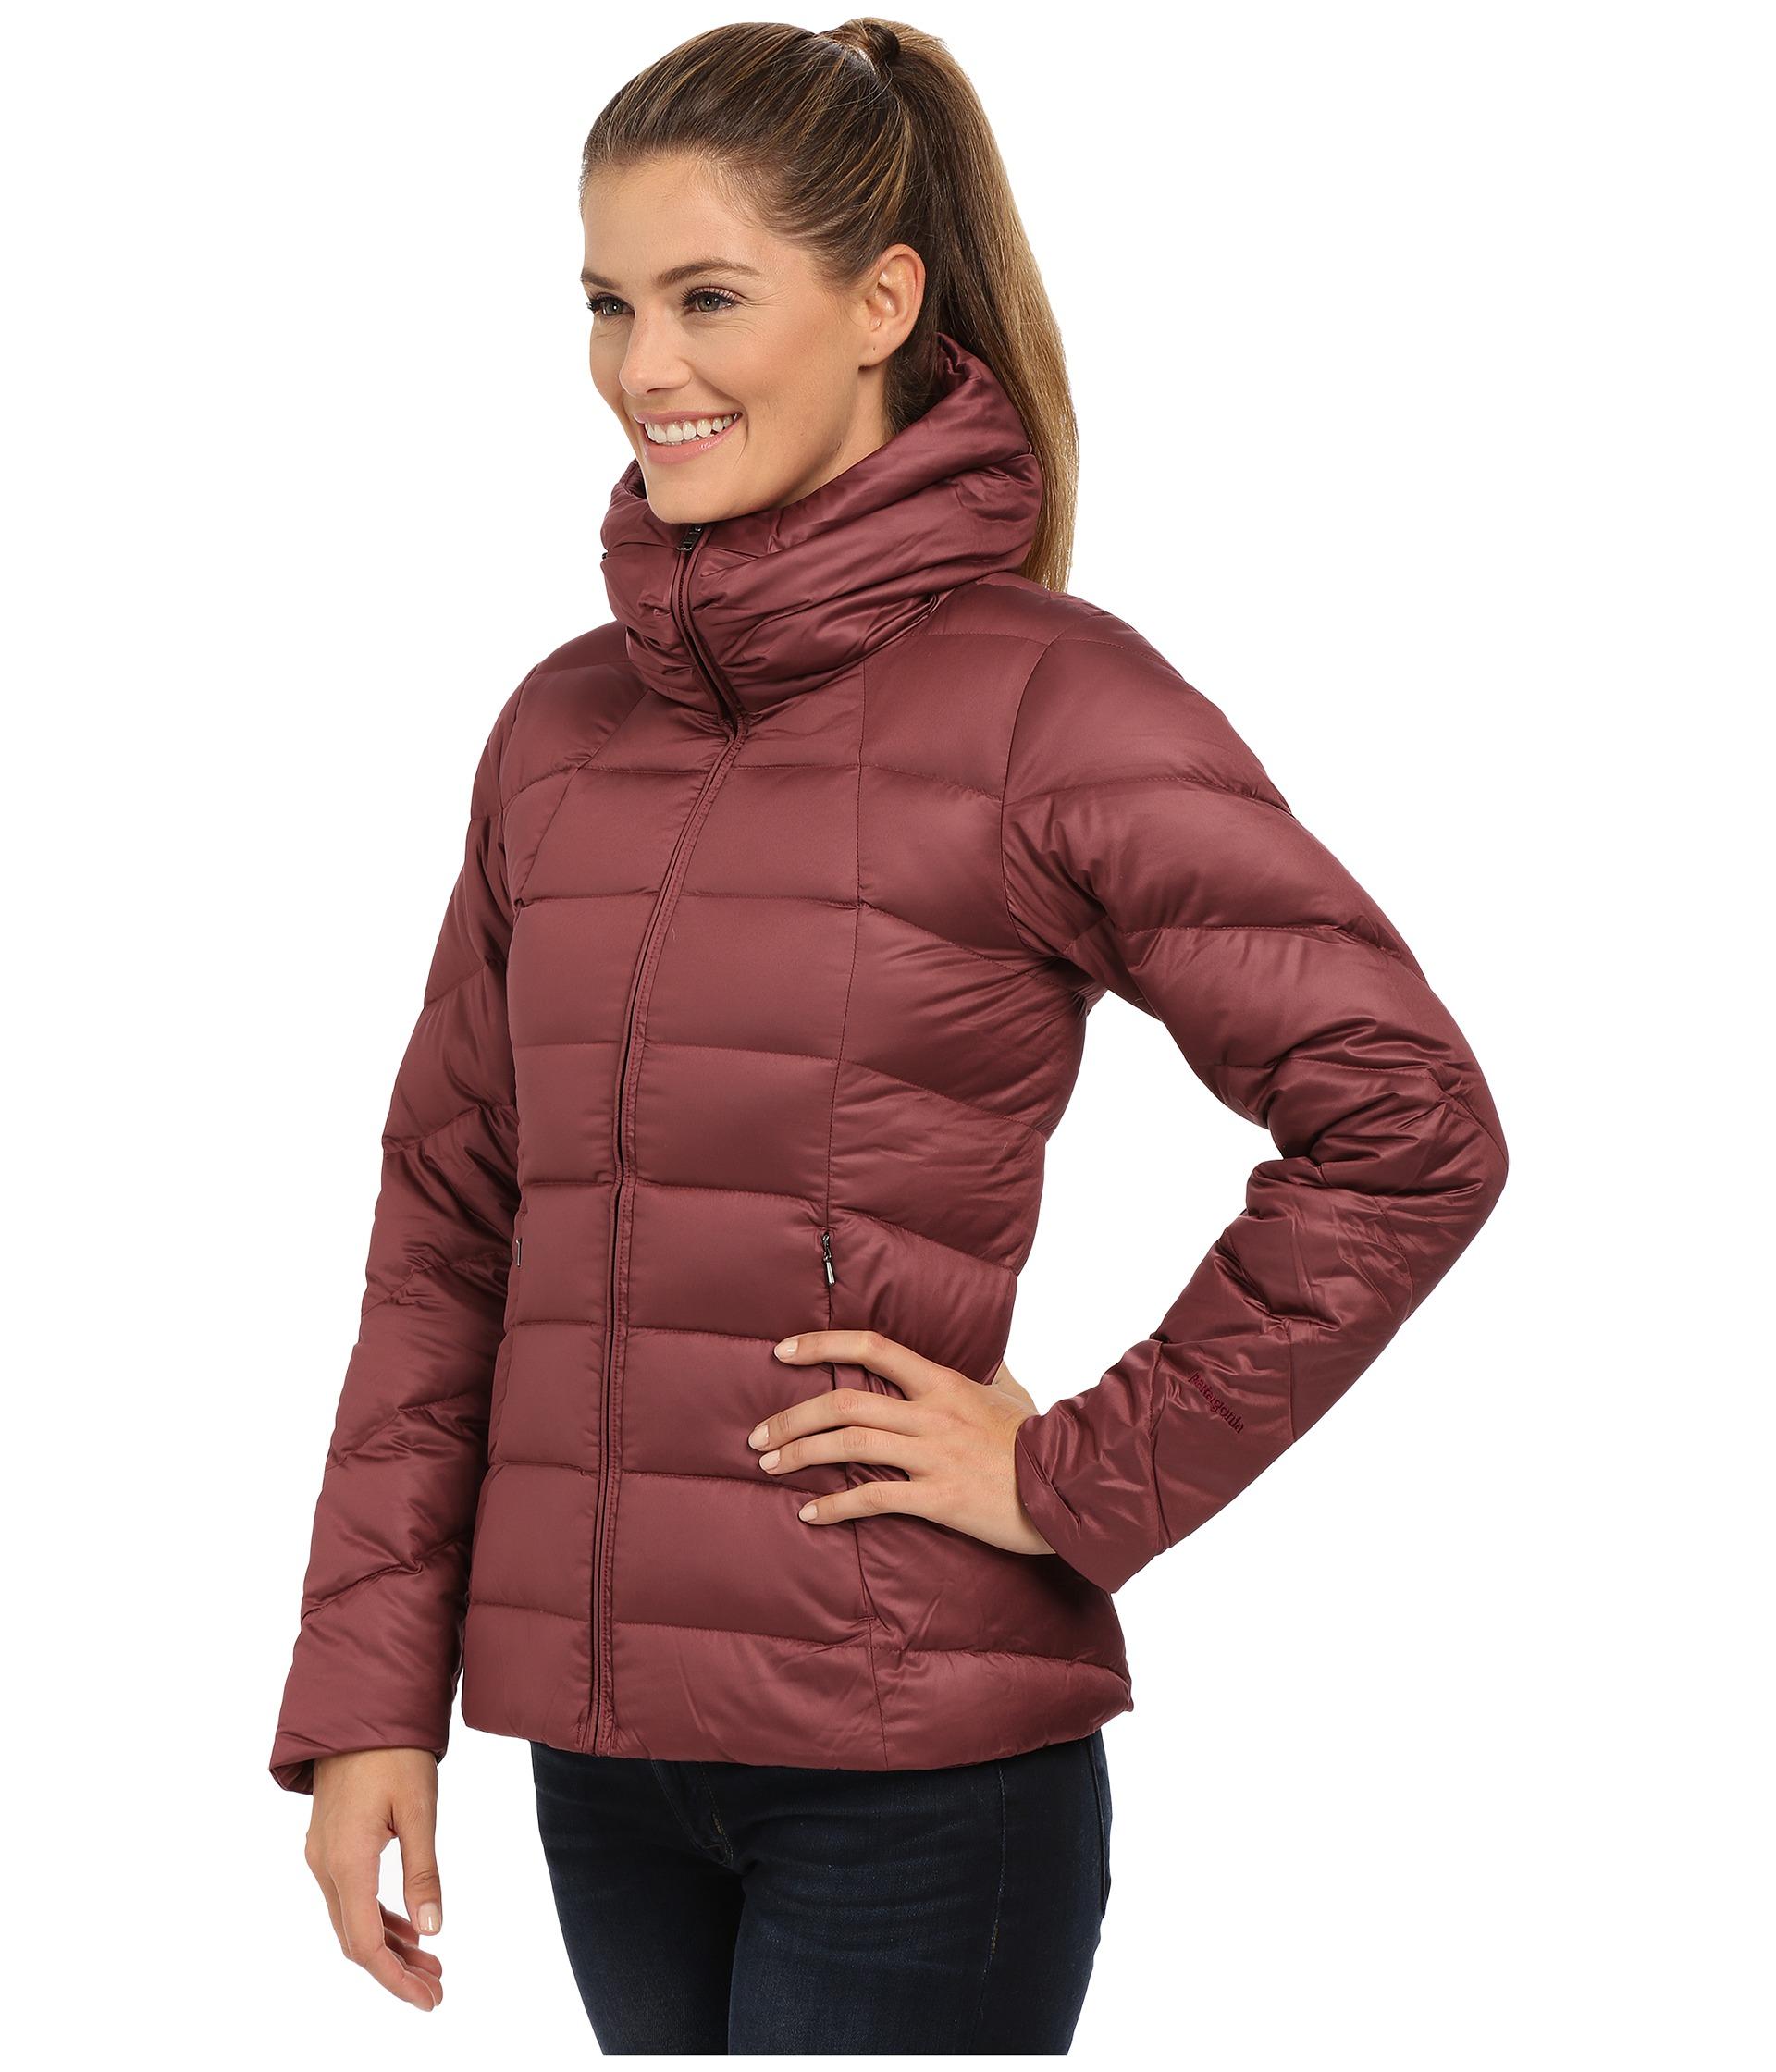 Patagonia Downtown Loft Jacket Zappos Com Free Shipping